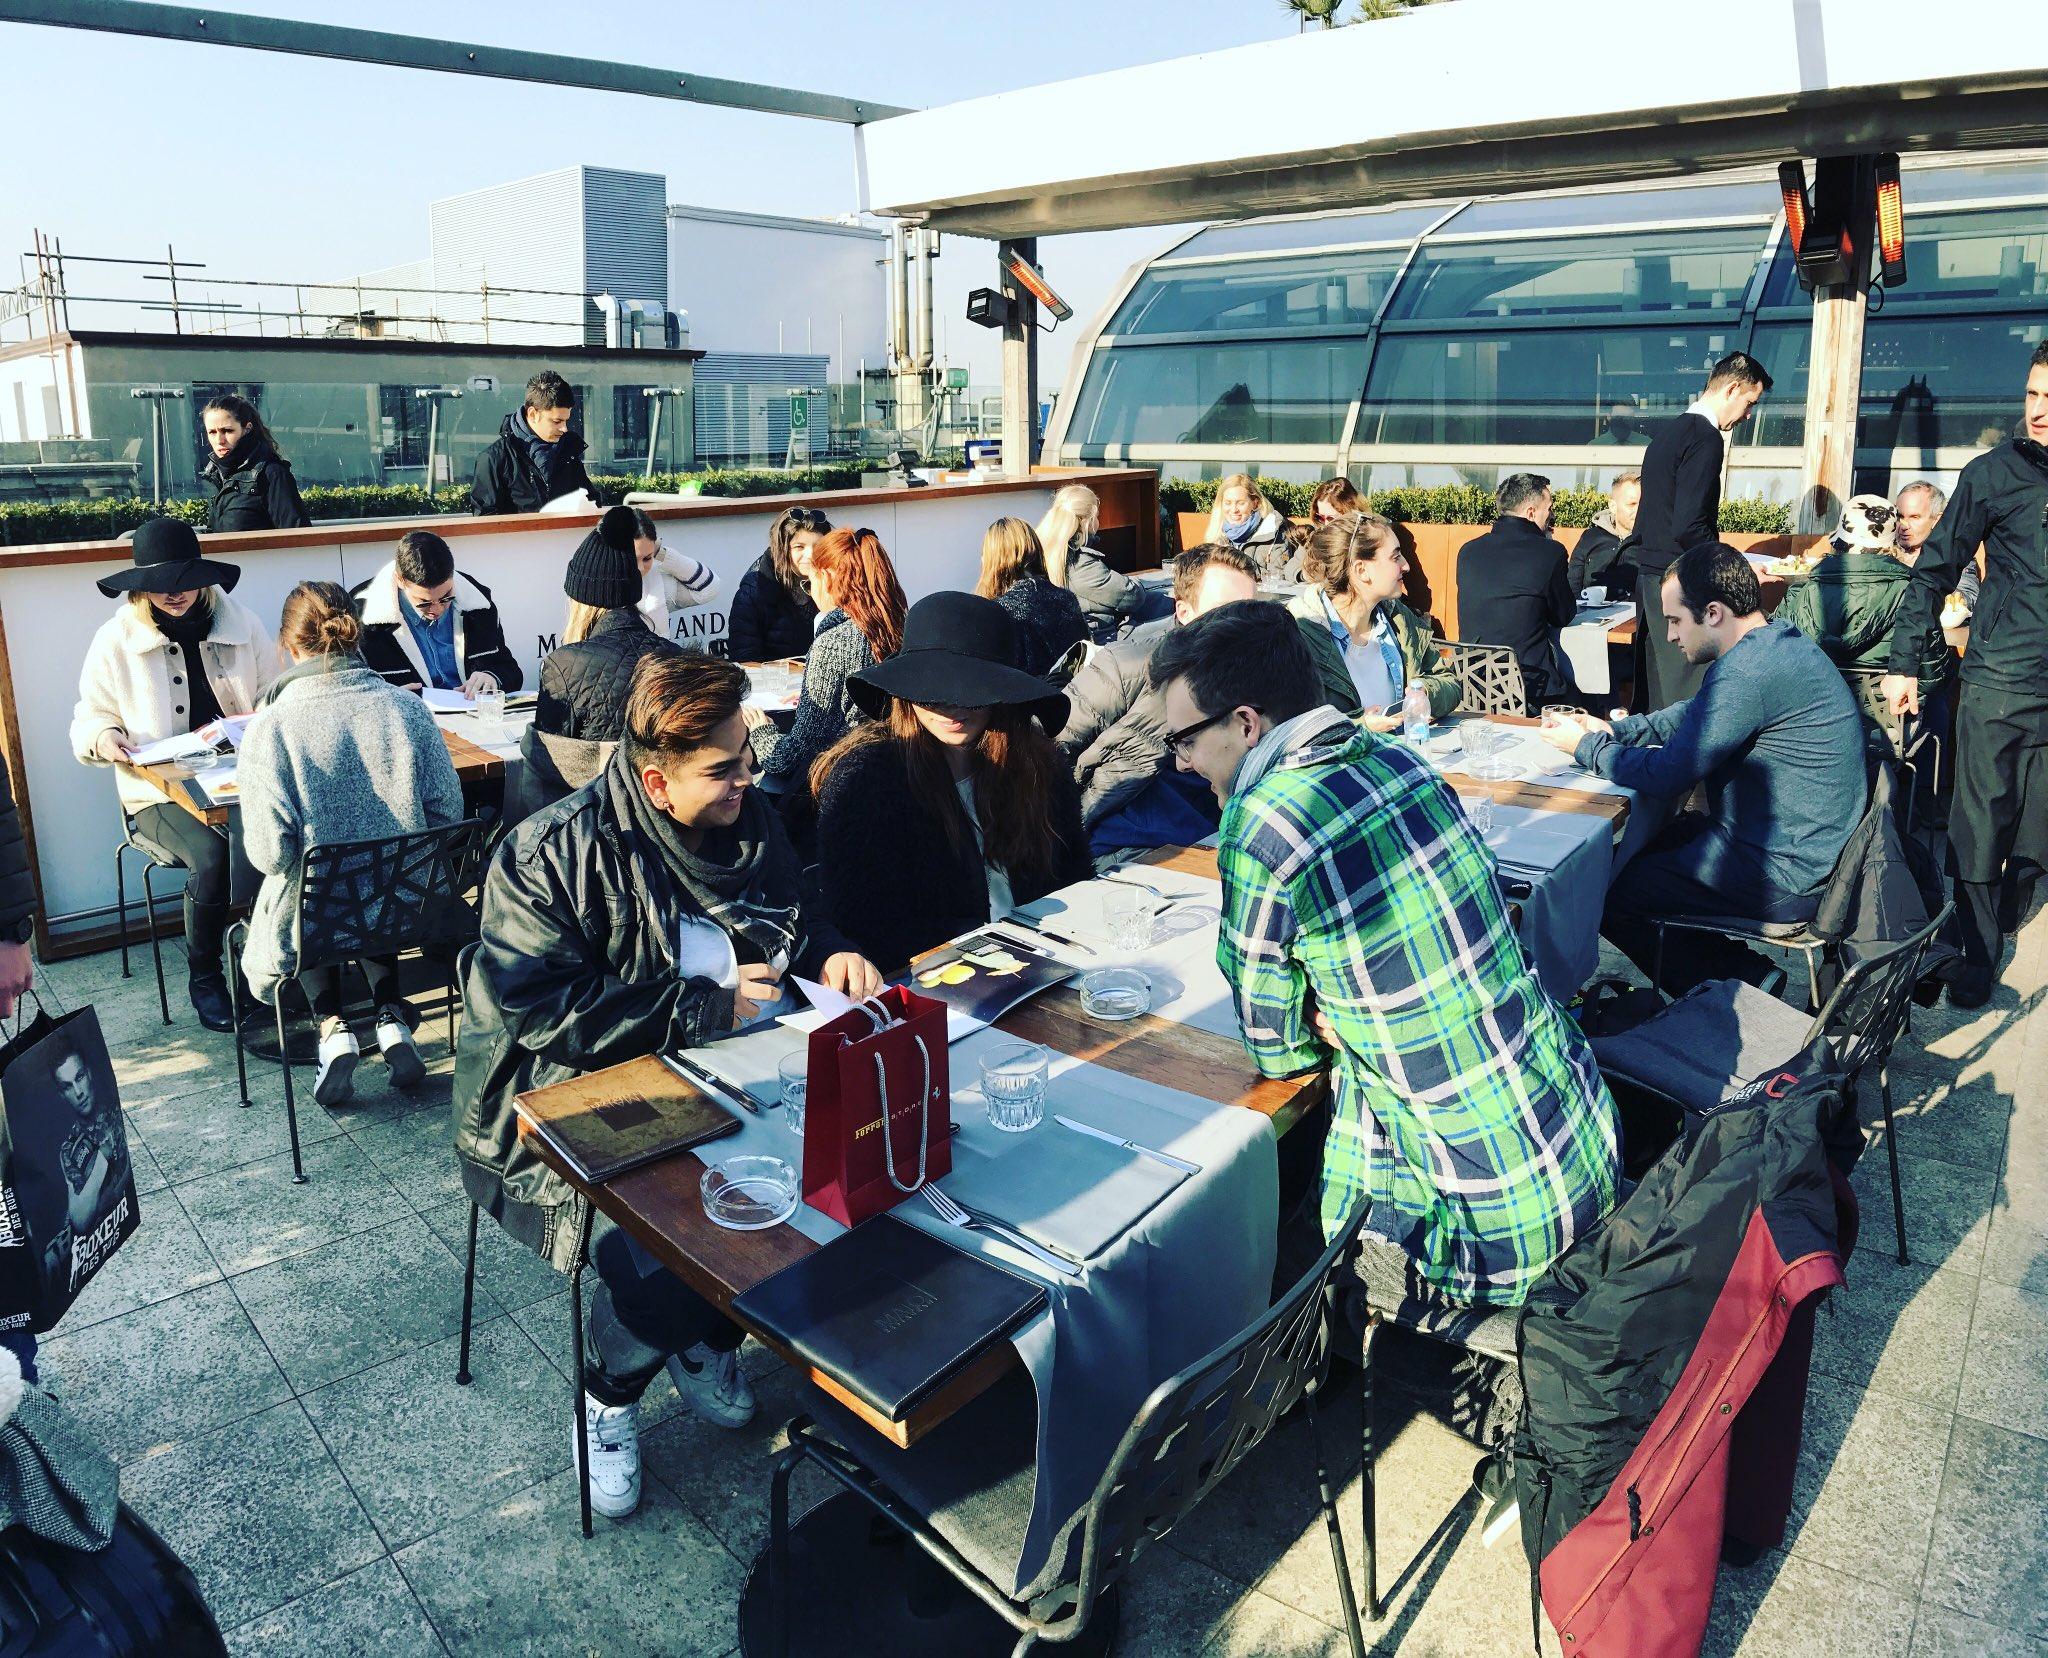 Rooftop restaurants are pretty cool #UDAbroad @UDGlobal @UDelaware @JohnCabotRome #Milan https://t.co/nHuNl0y9Yg